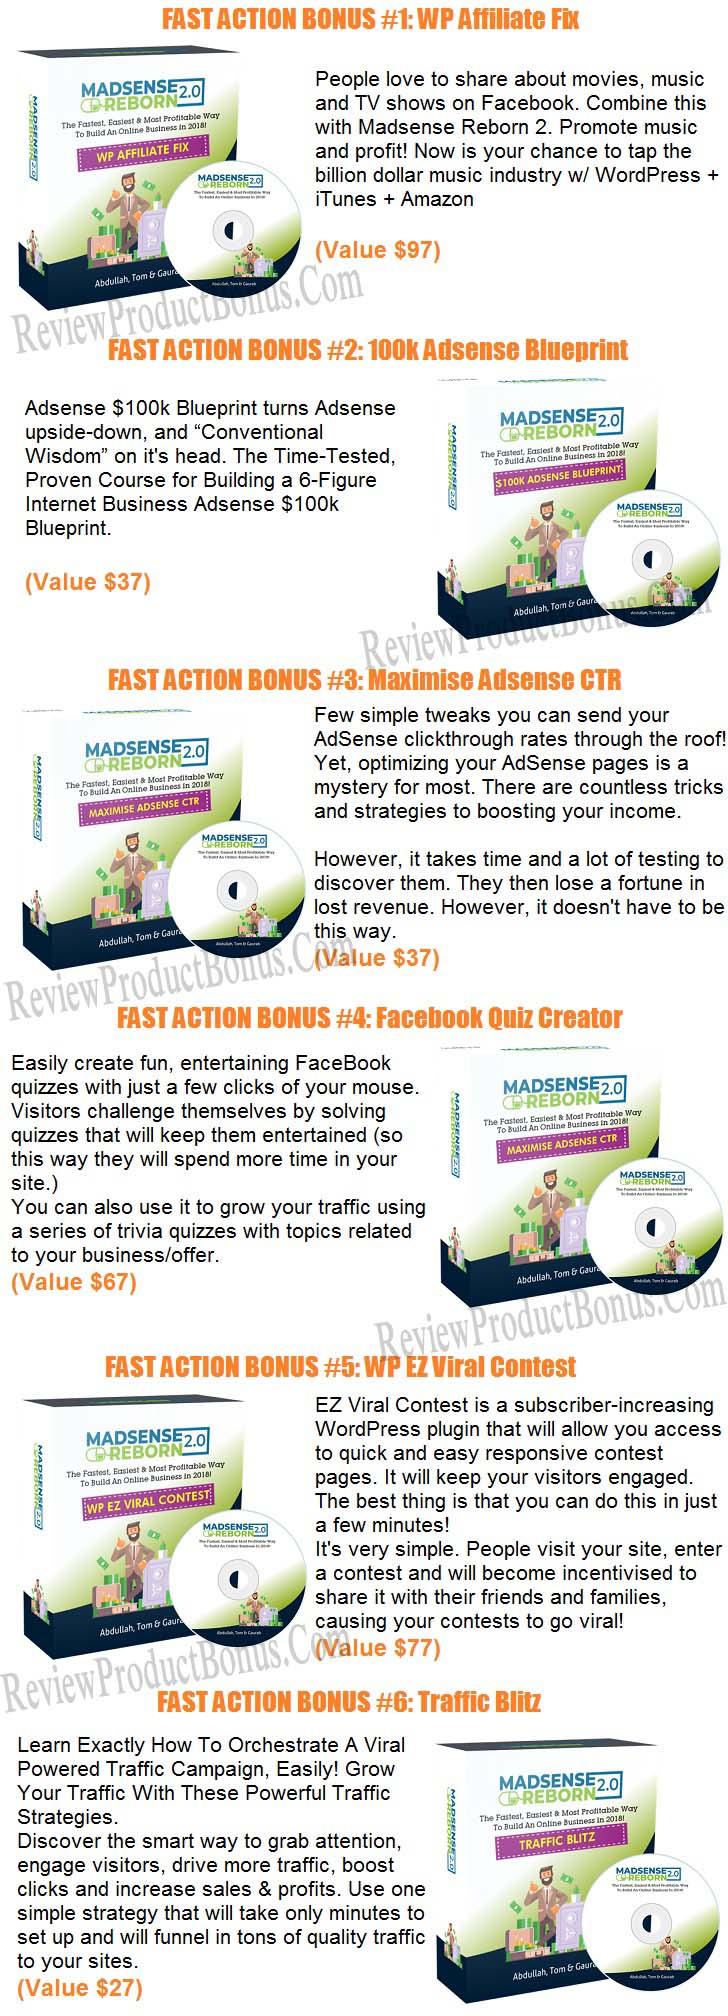 Madsense Reborn 2.0 Bonus